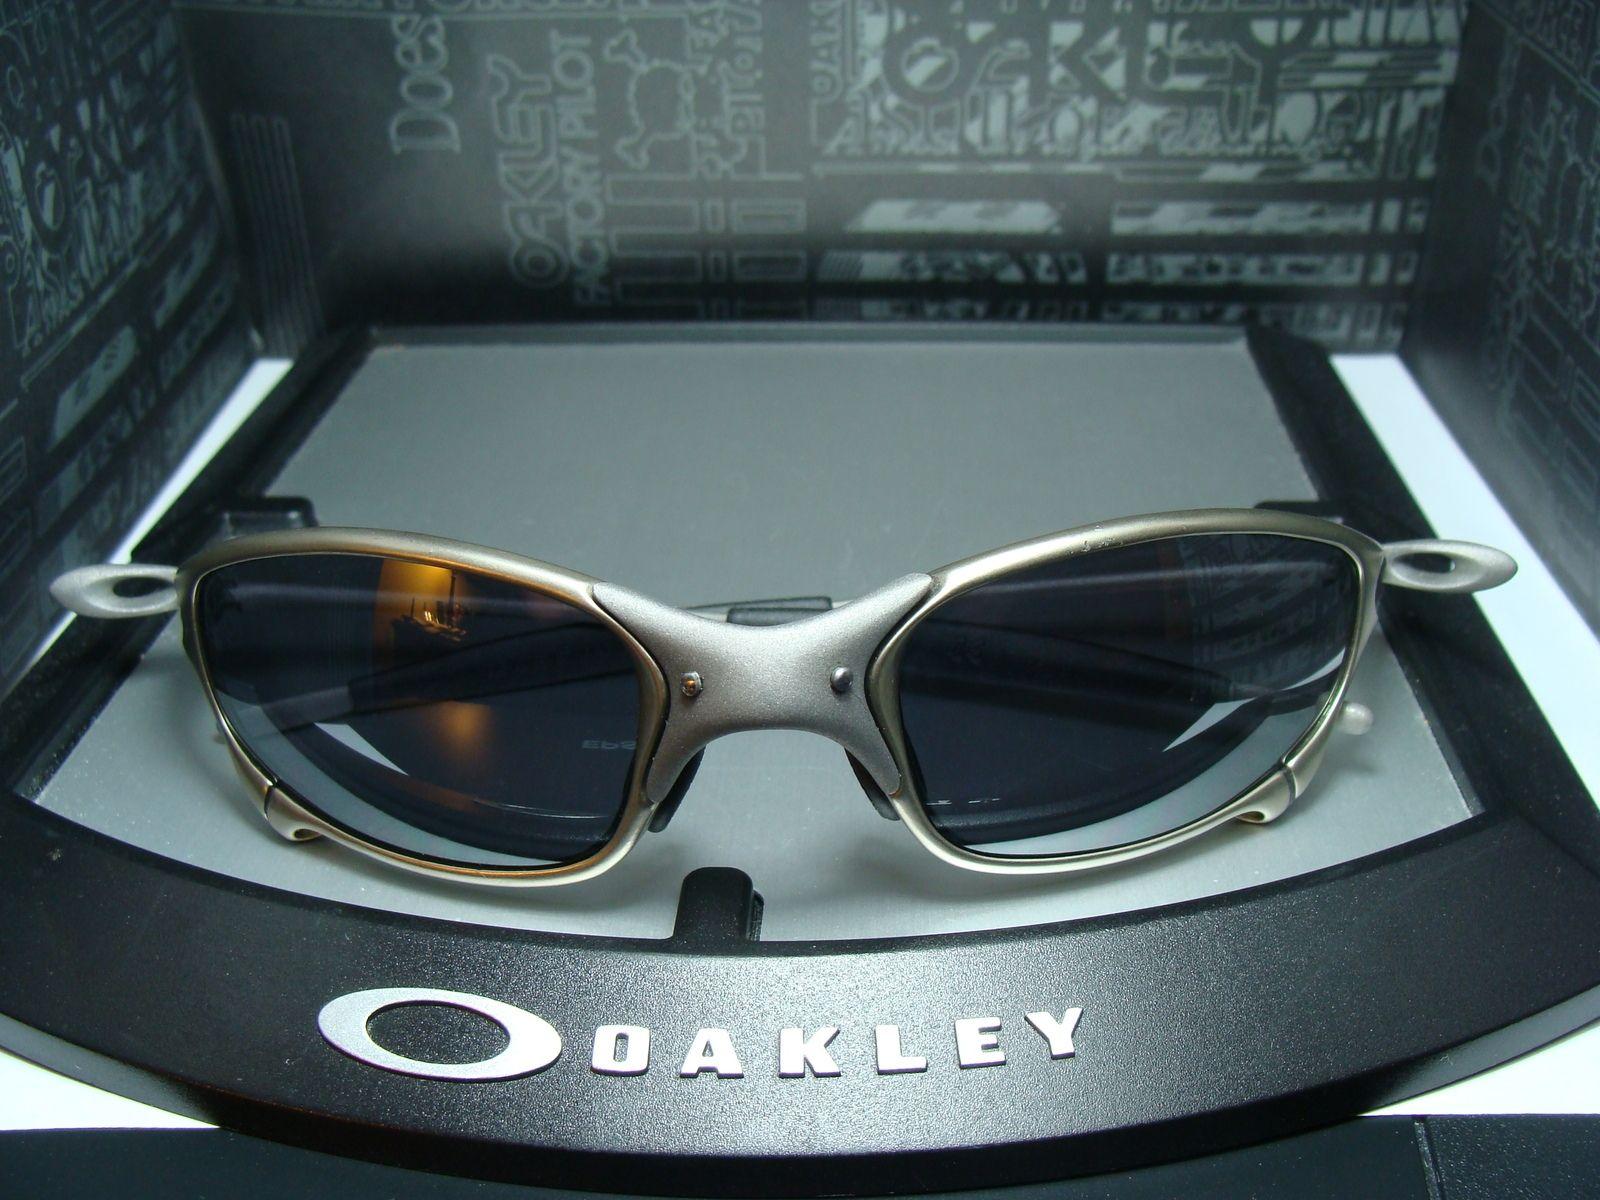 Juliet XMAN Ti-02,  Brand New Plasma Frame Turned Into A Ti-02, W/ New Black Lenses - DSC04870.JPG